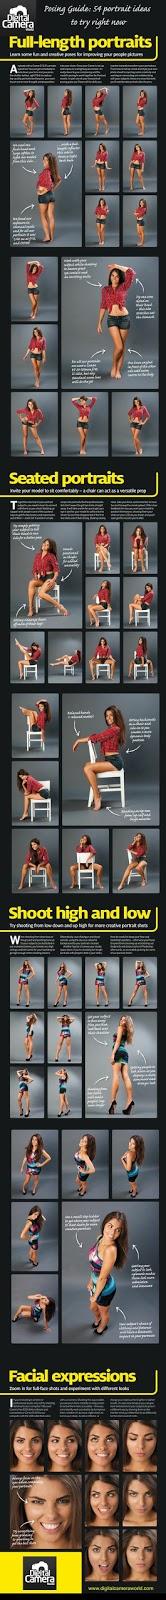 Posings für Frauen - Foto